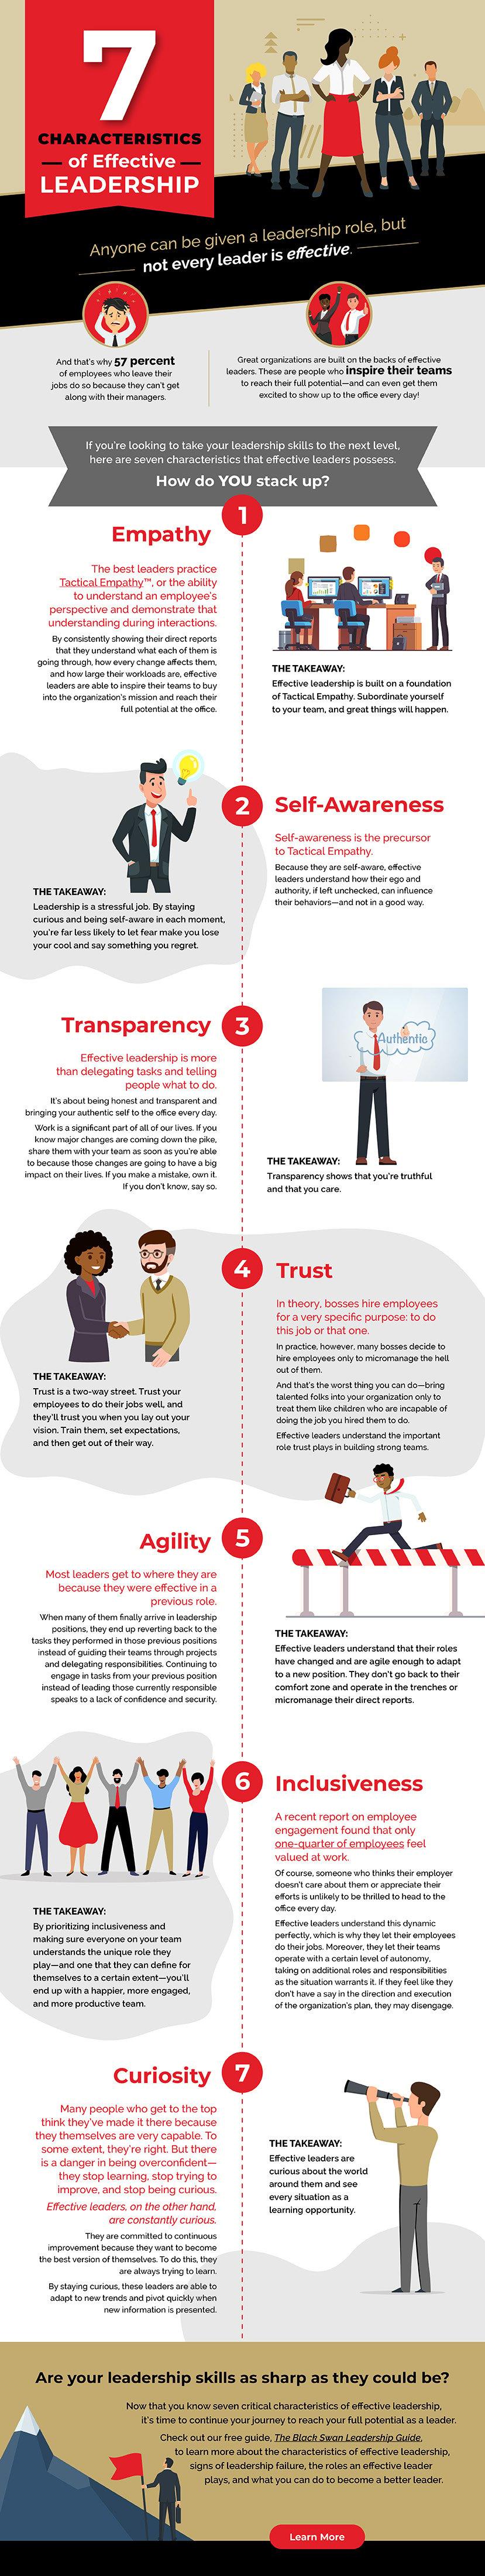 Black Swan 7 Leadership Characteristics